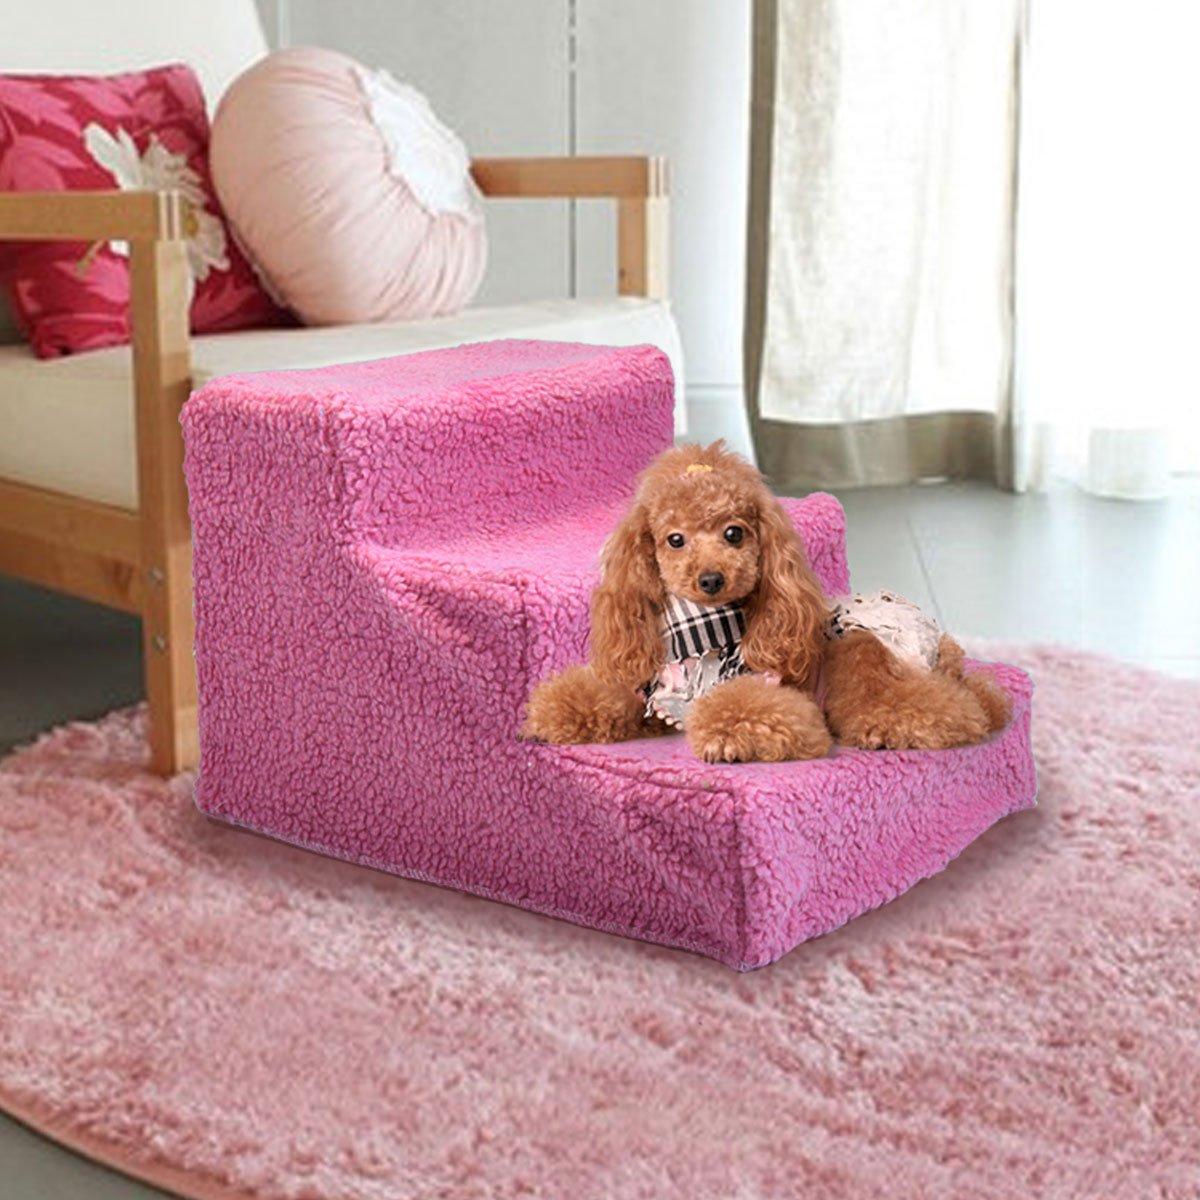 Tobbi Pet Stairs 3 Steps Indoor Dog Cat Steps Removable Washable Pets Ramp Ladder Pink by Tobbi (Image #3)